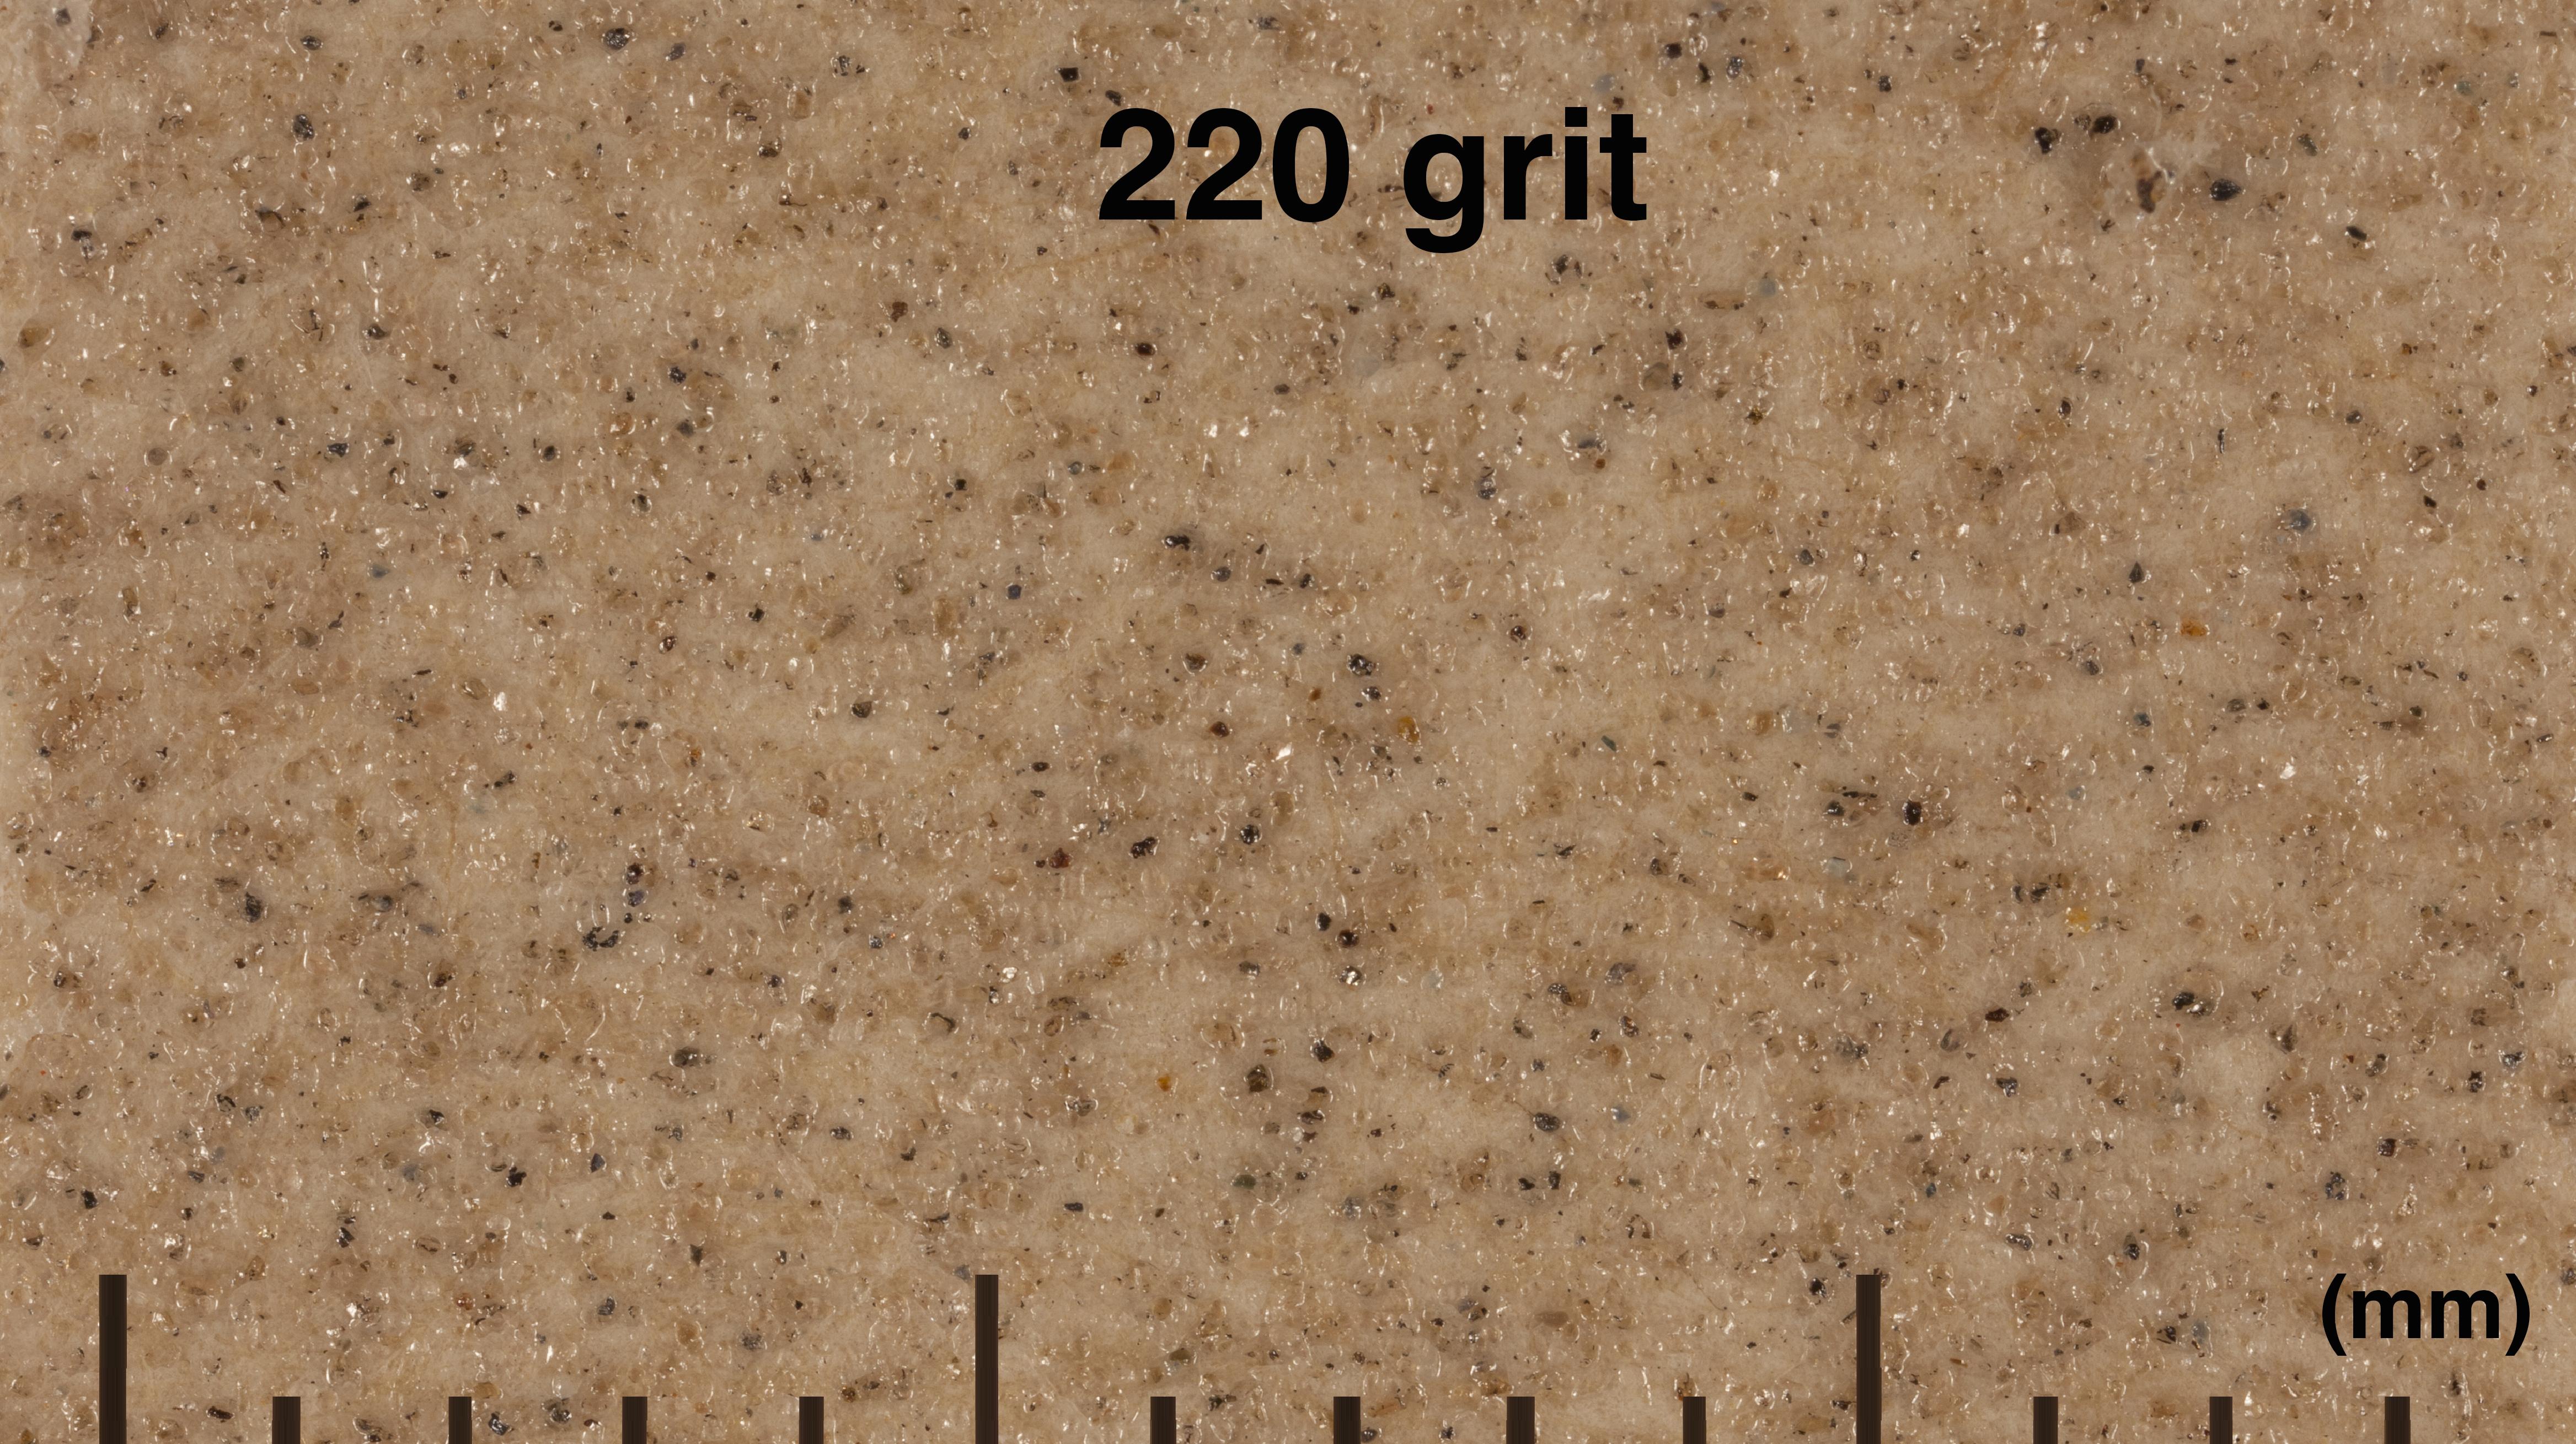 220 grit (scale).jpg